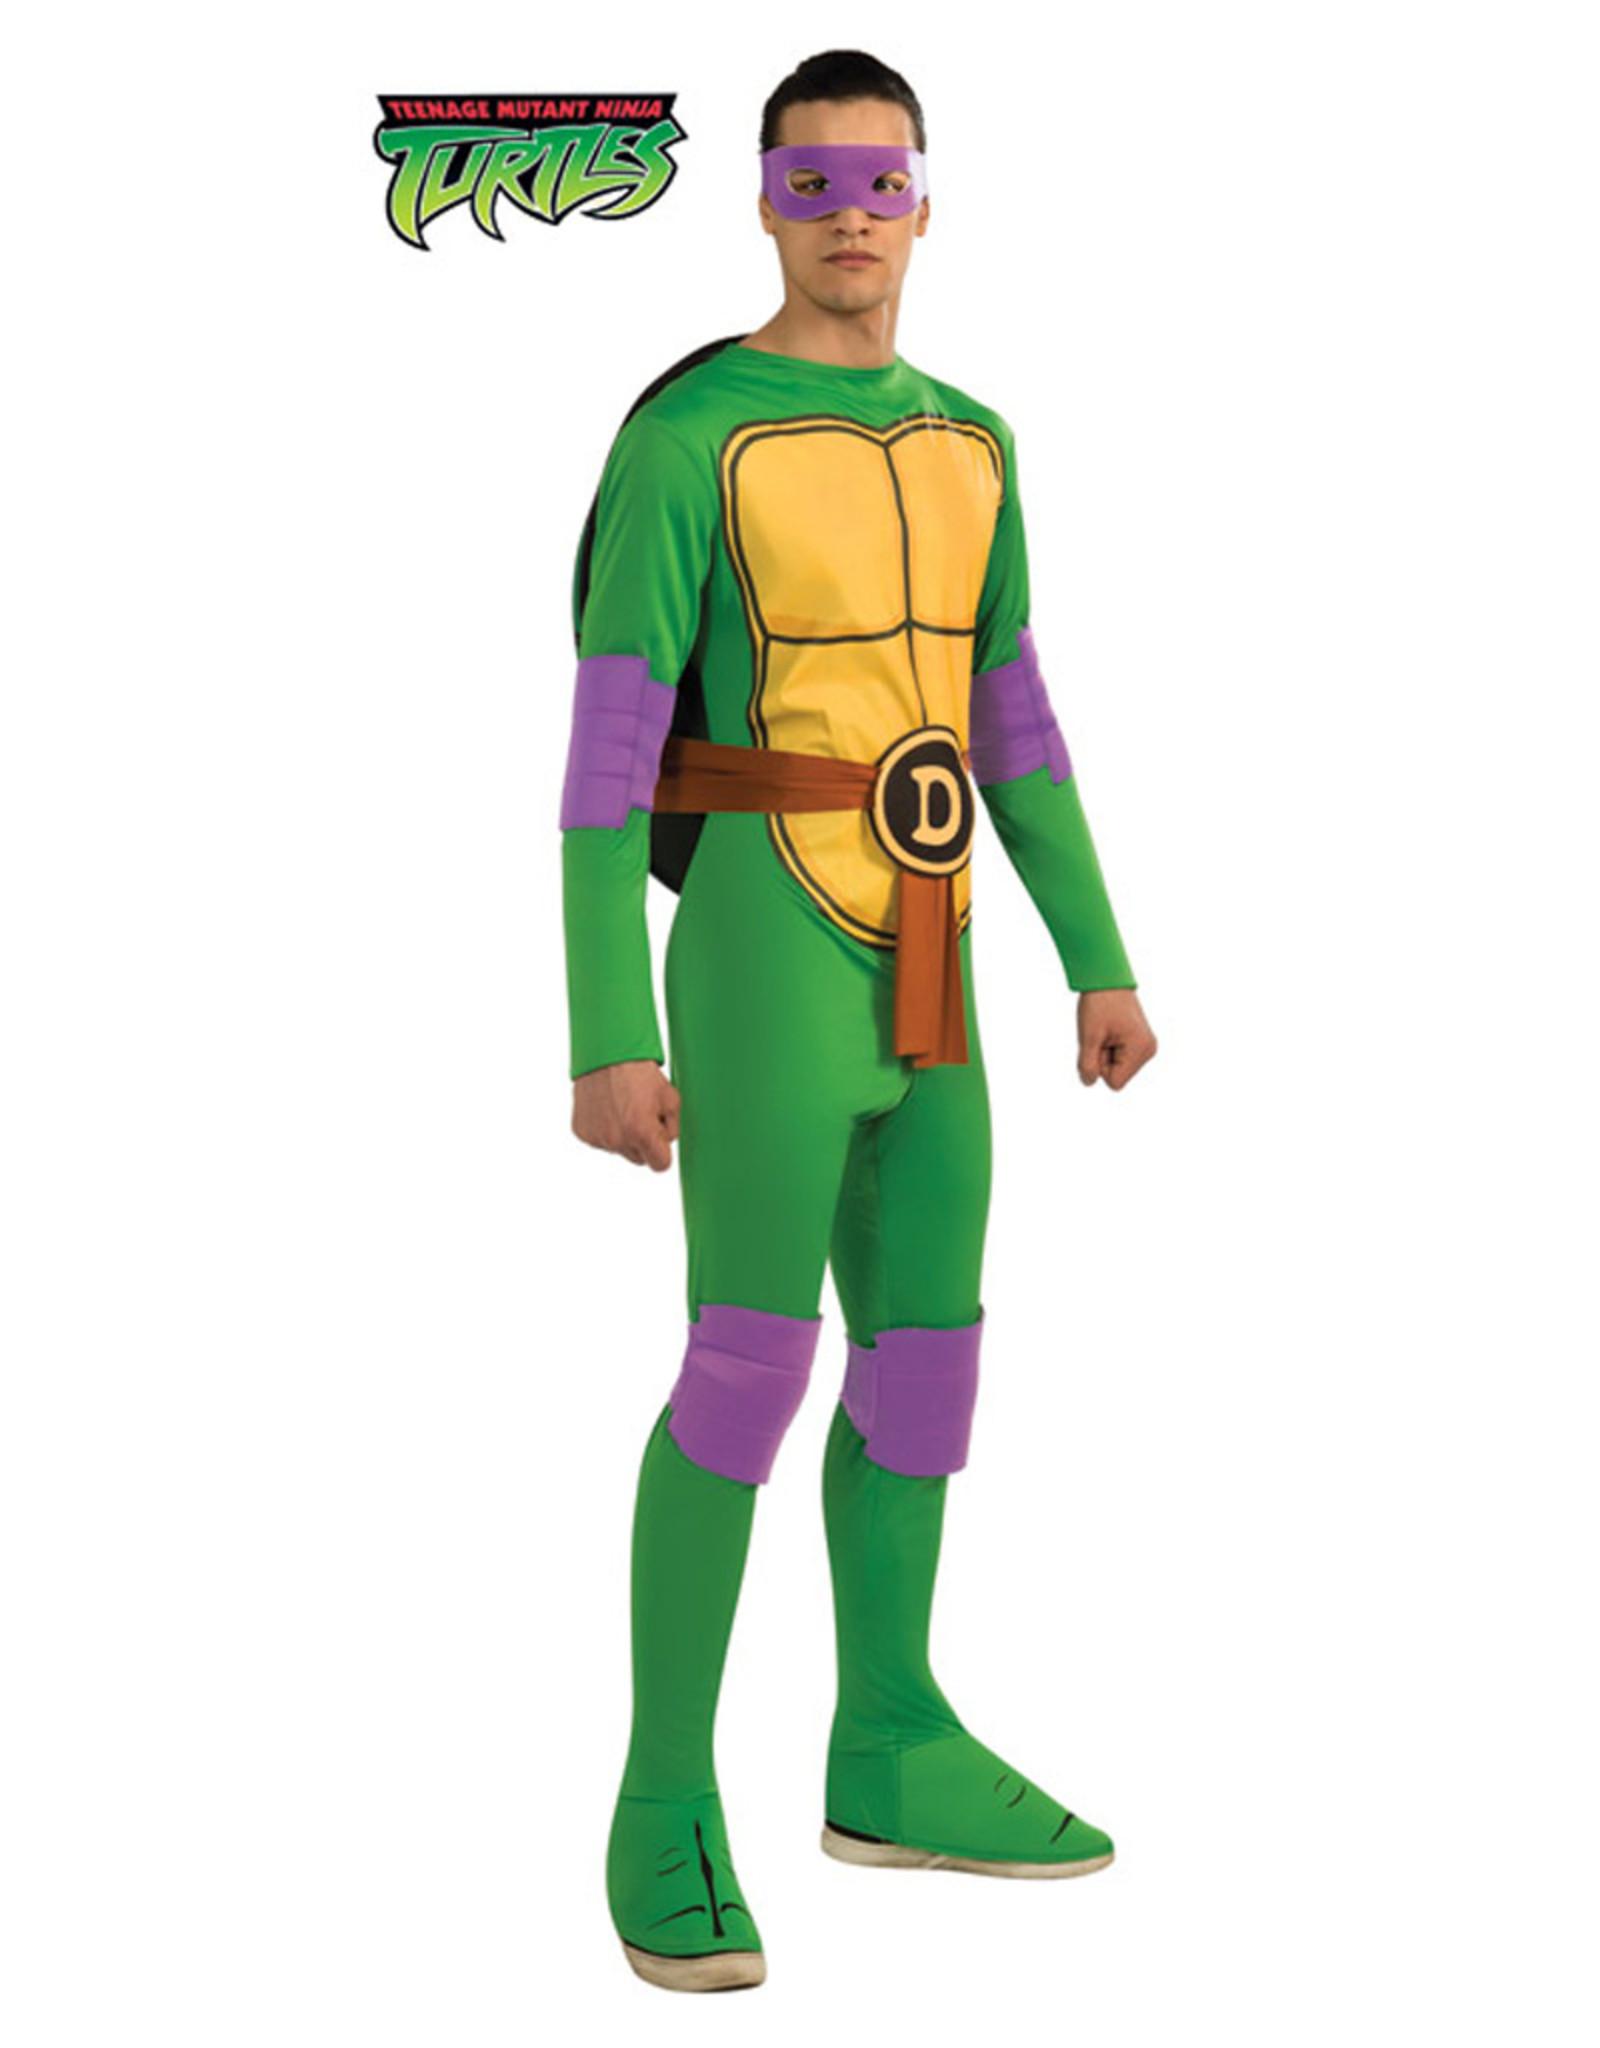 Donatello TMNT Costume - Men's